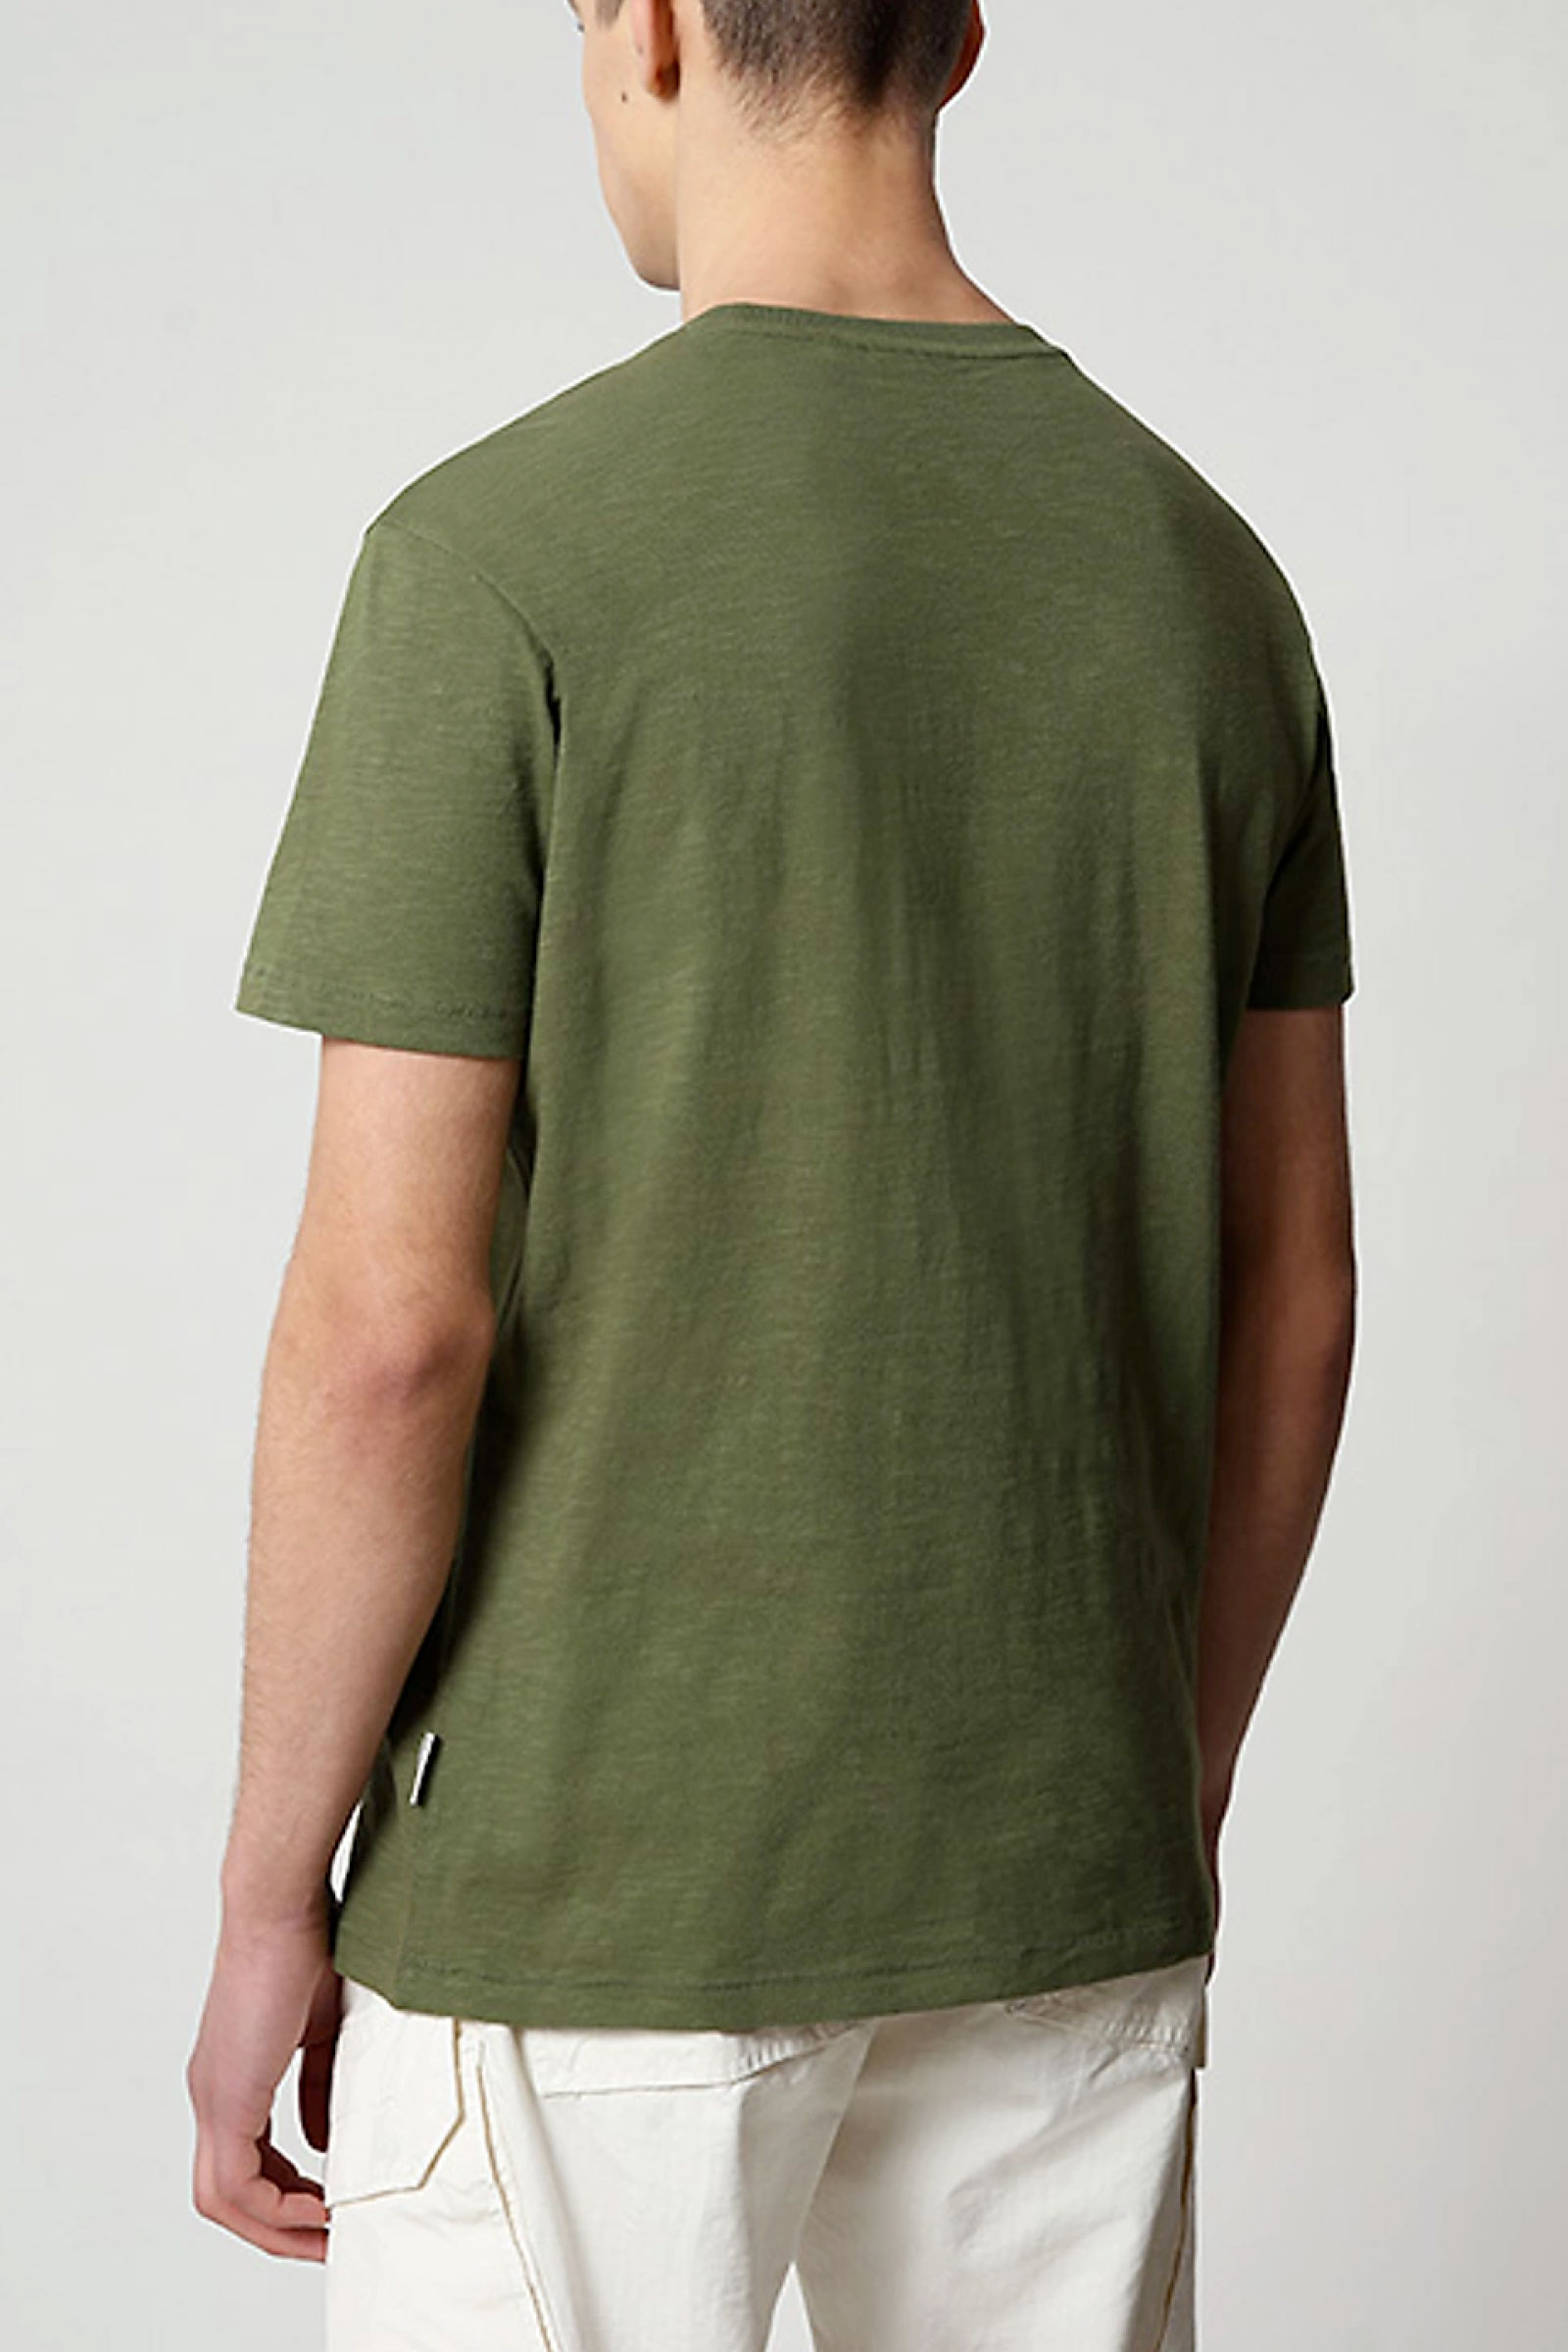 T-Shirt Uomo Modello SILEA NAPAPIJRI | T-Shirt | NP0A4F6JG2C1